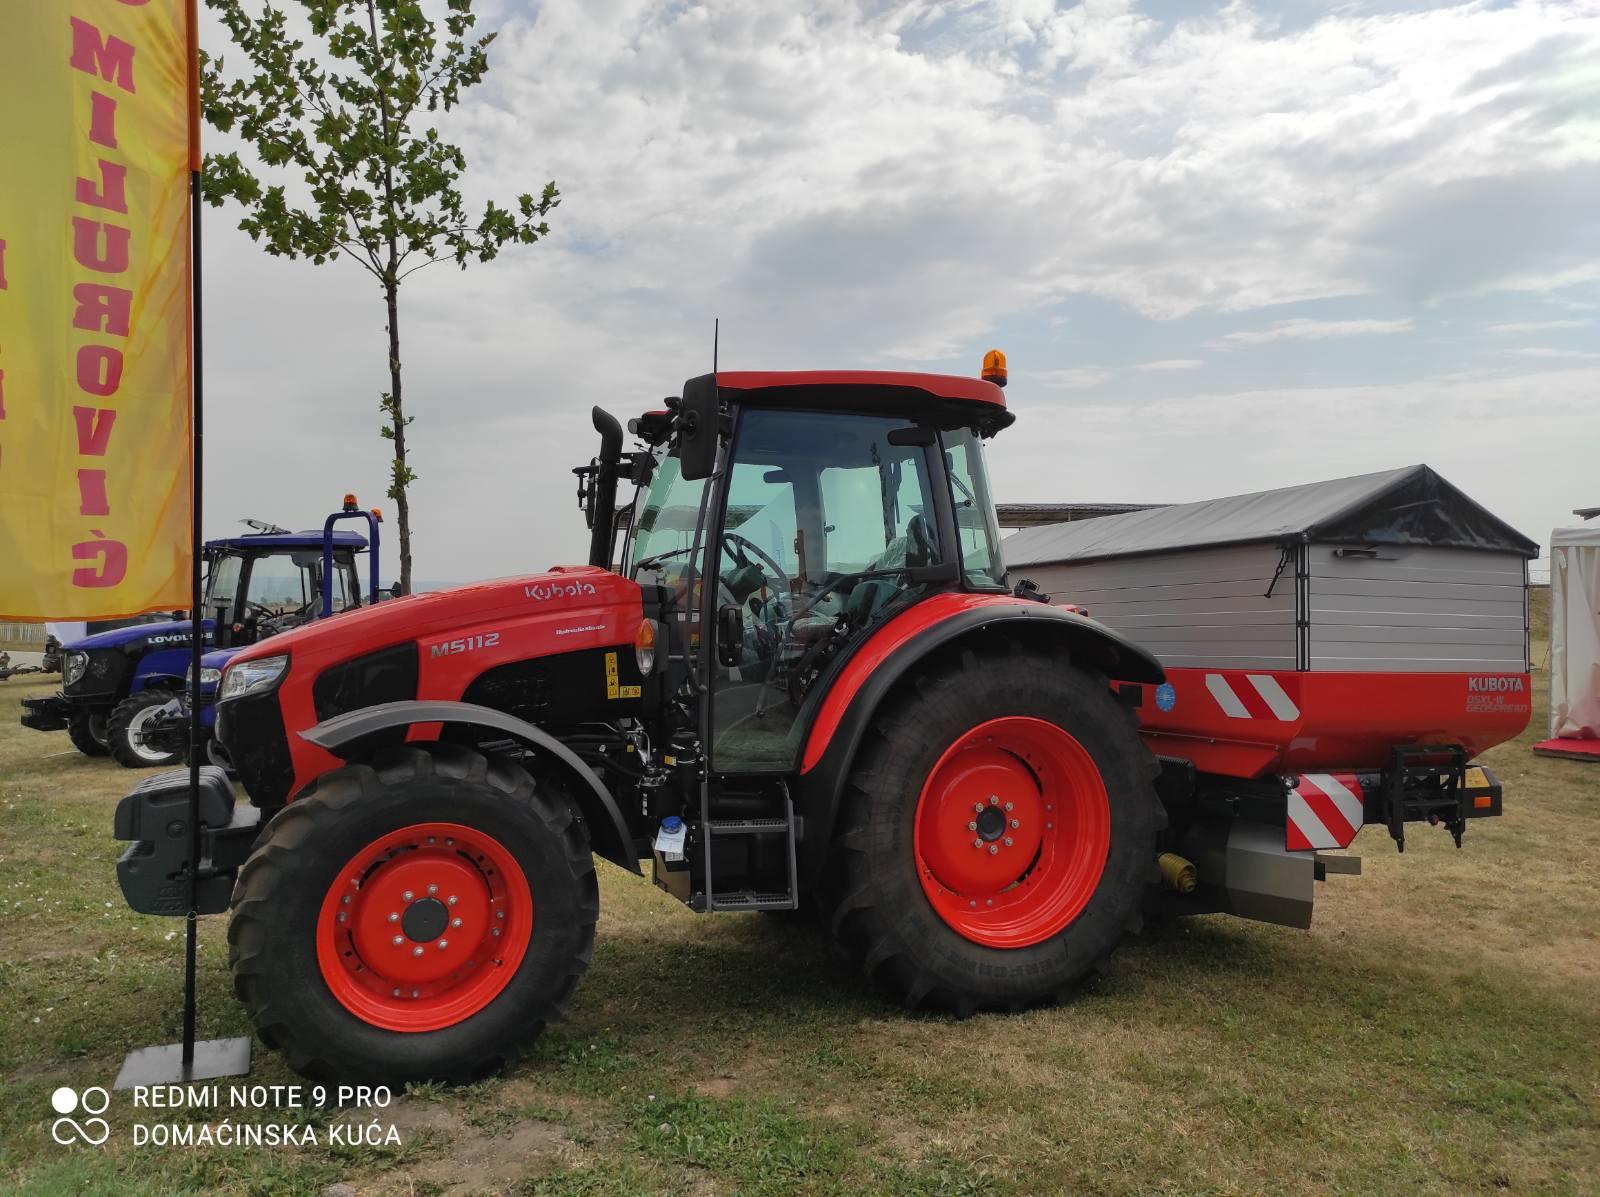 Traktor, ilustracija, foto: S.K.